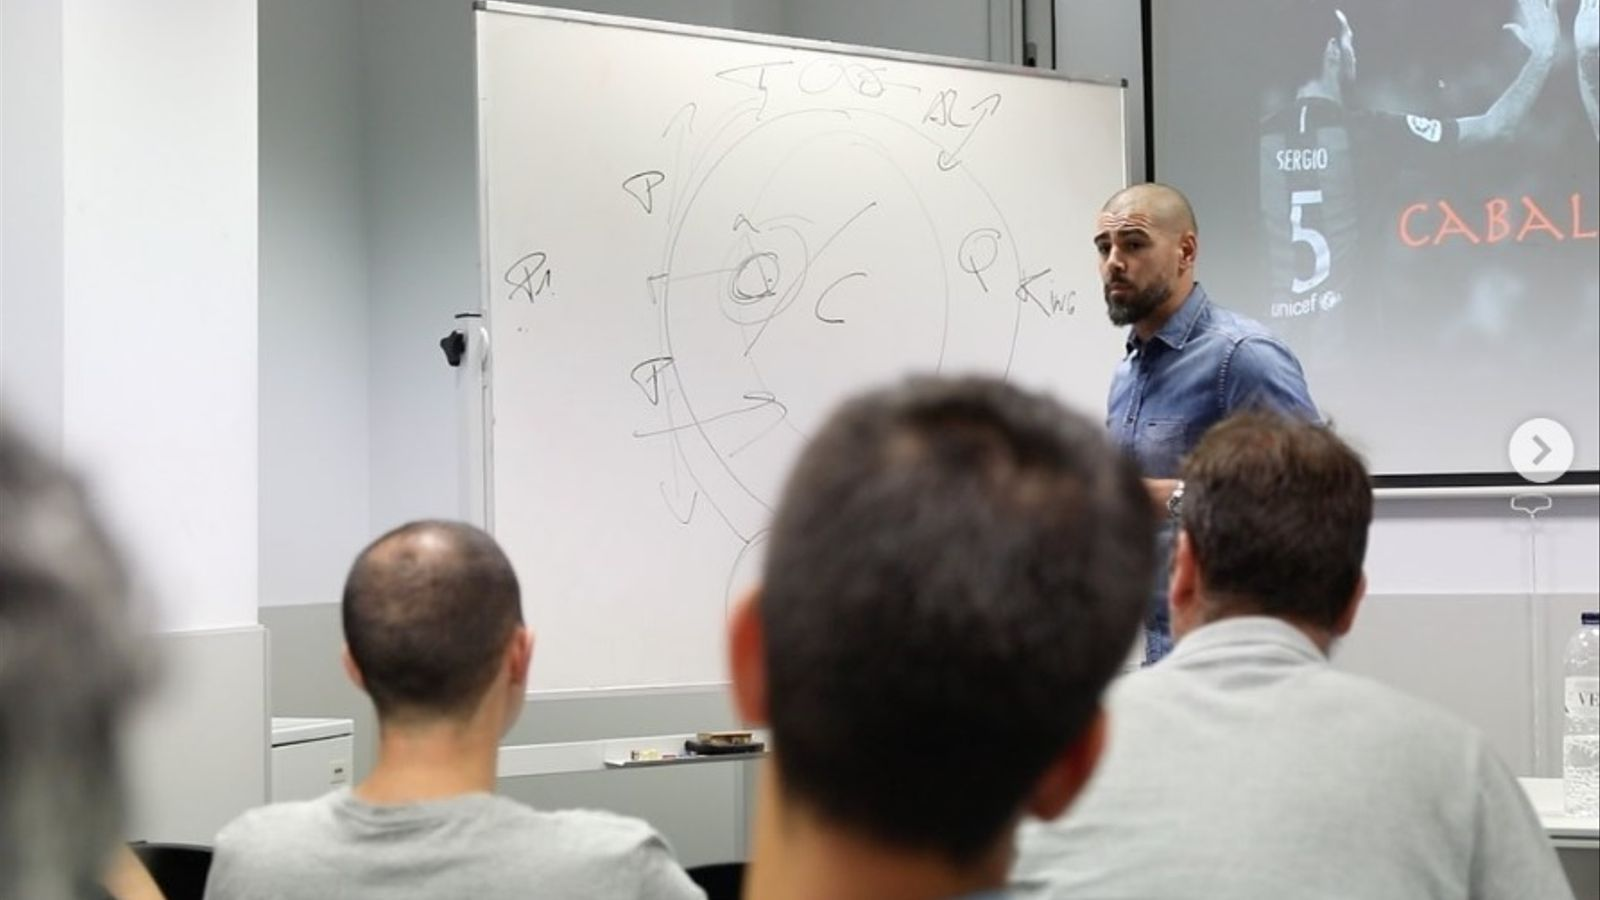 Víctor Valdés, durant la ponència al curs professional de la FCF a Cornellà